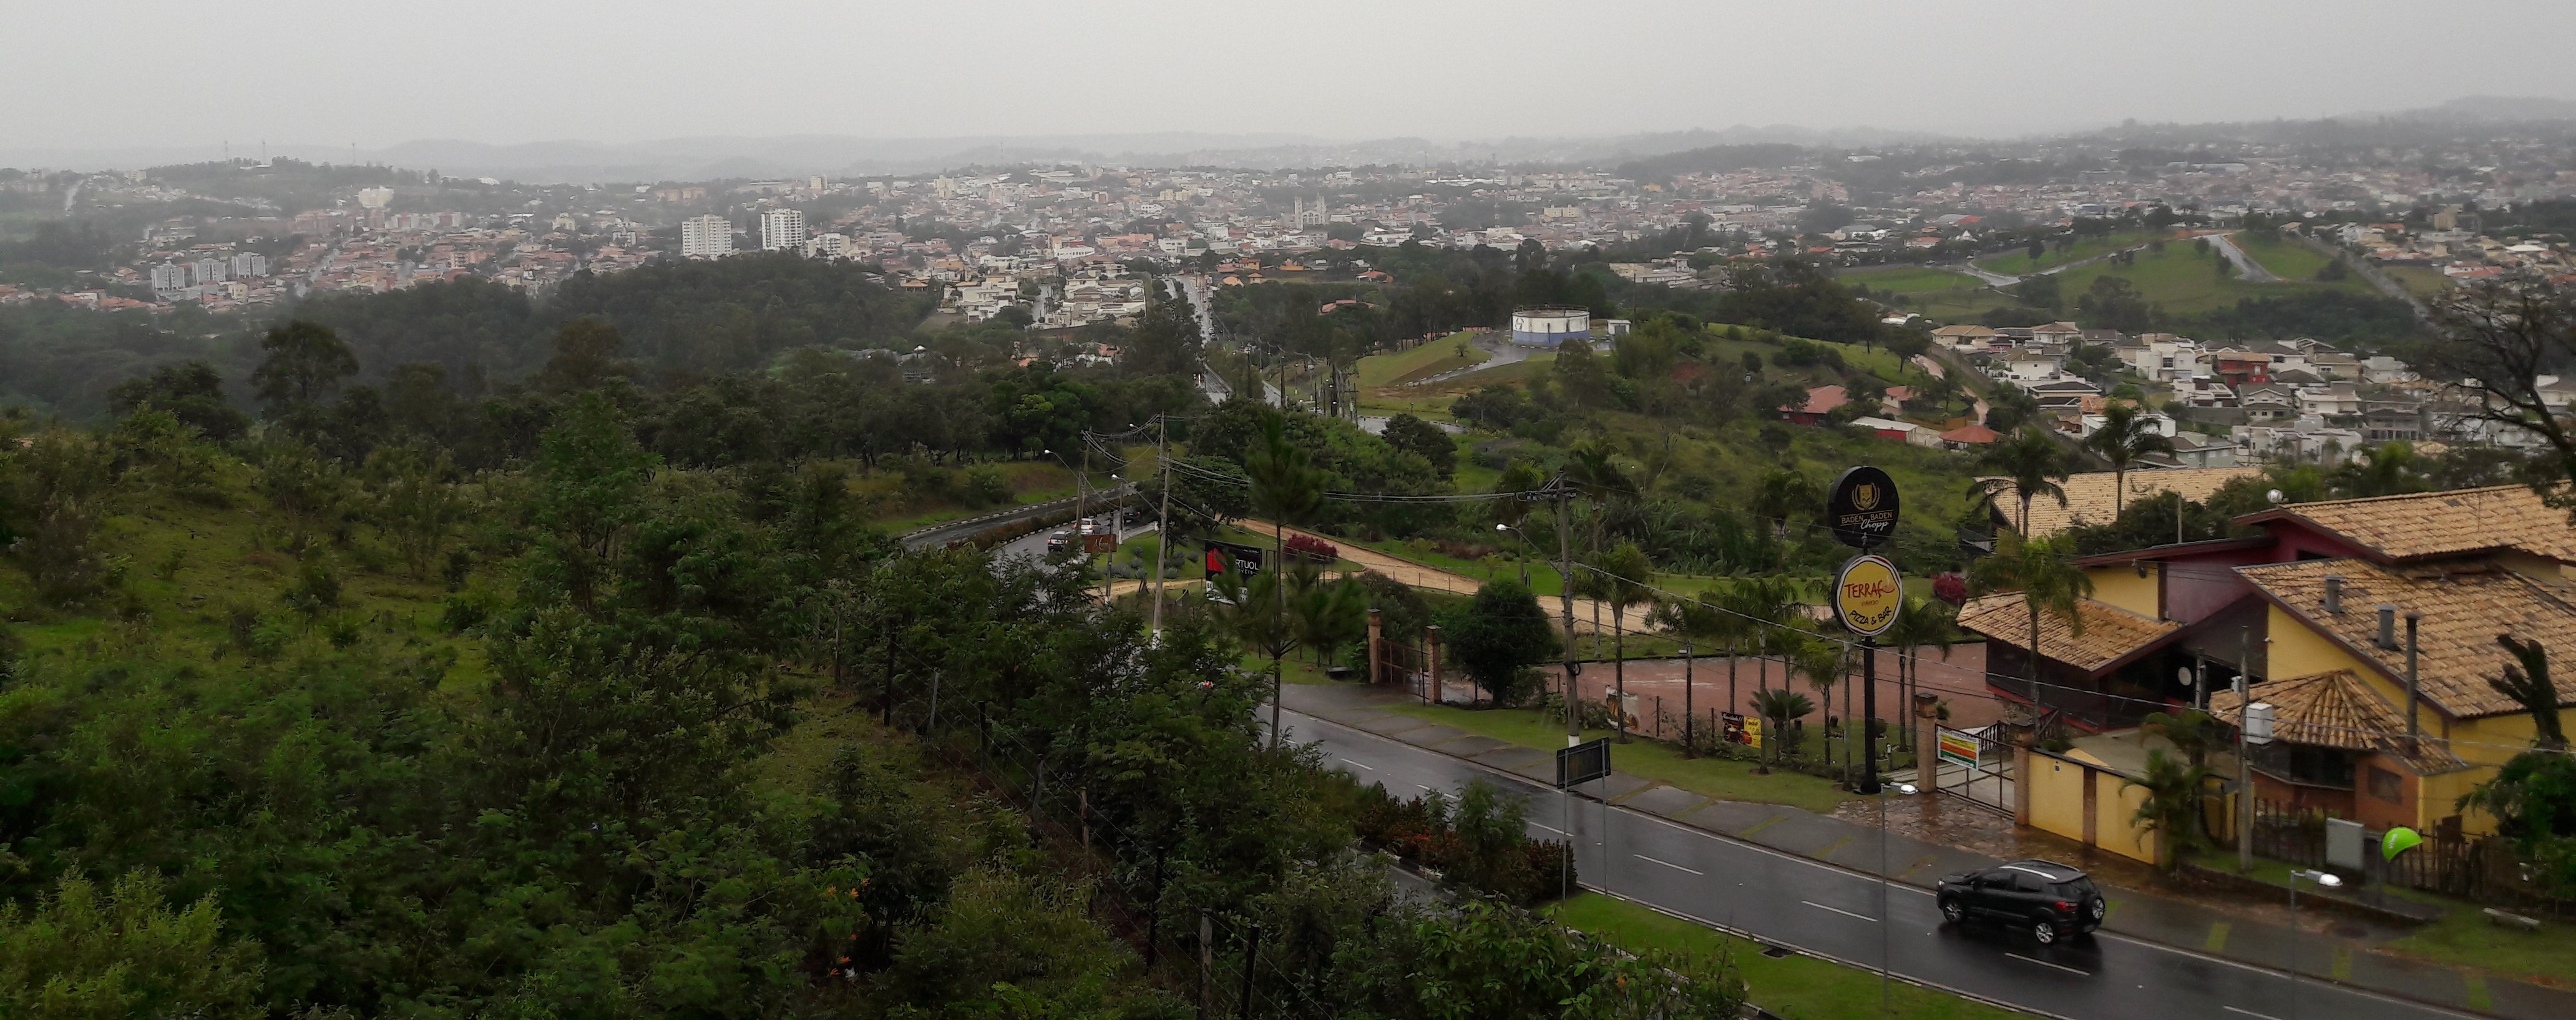 vinhedo-sp-mirador-view-of-city-may17